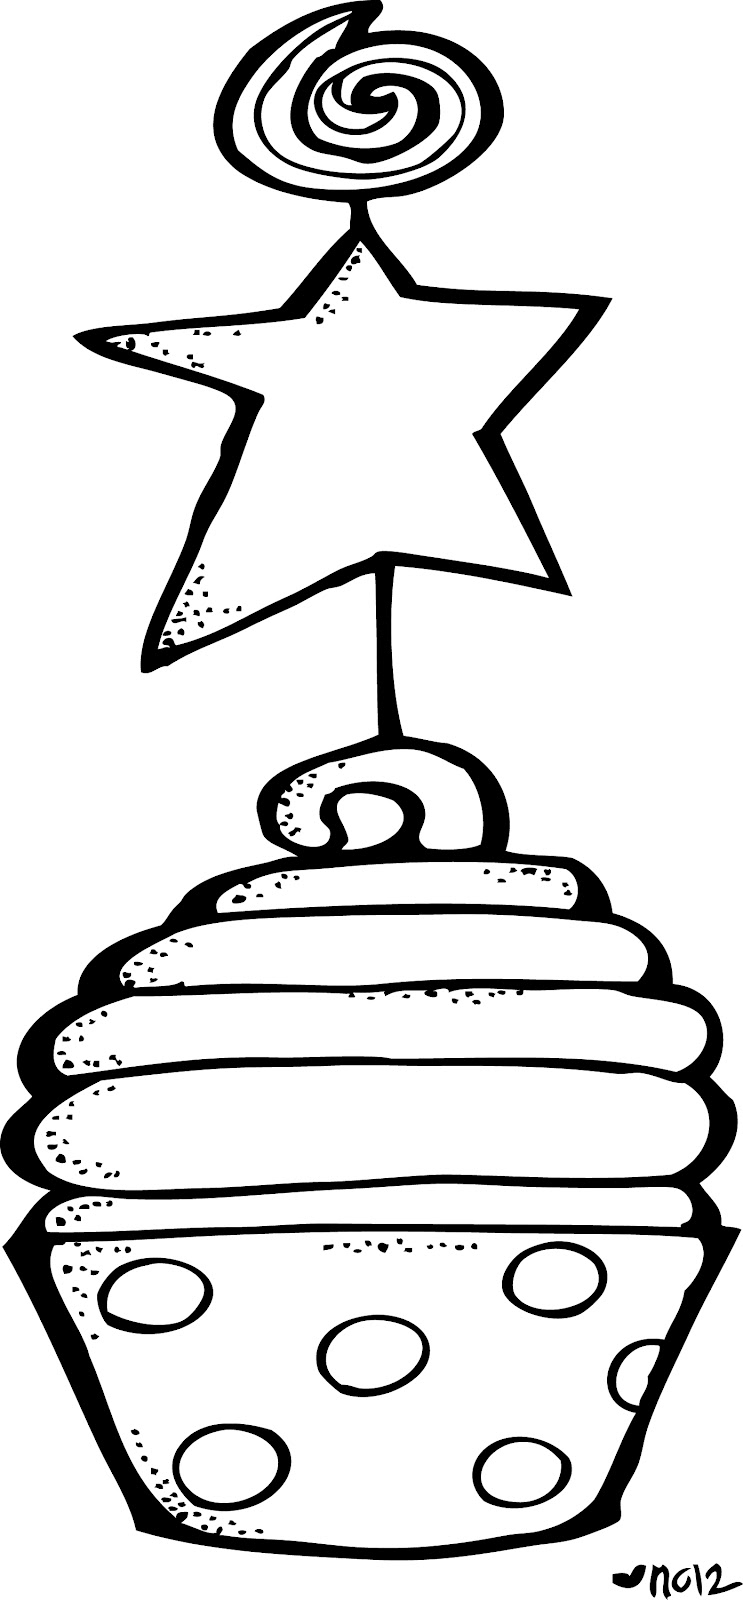 melonheadz happy birthday dr seuss rh melonheadzillustrating blogspot com Printable Dr. Seuss Clip Art Dr. Seuss Thing 1 Clip Art